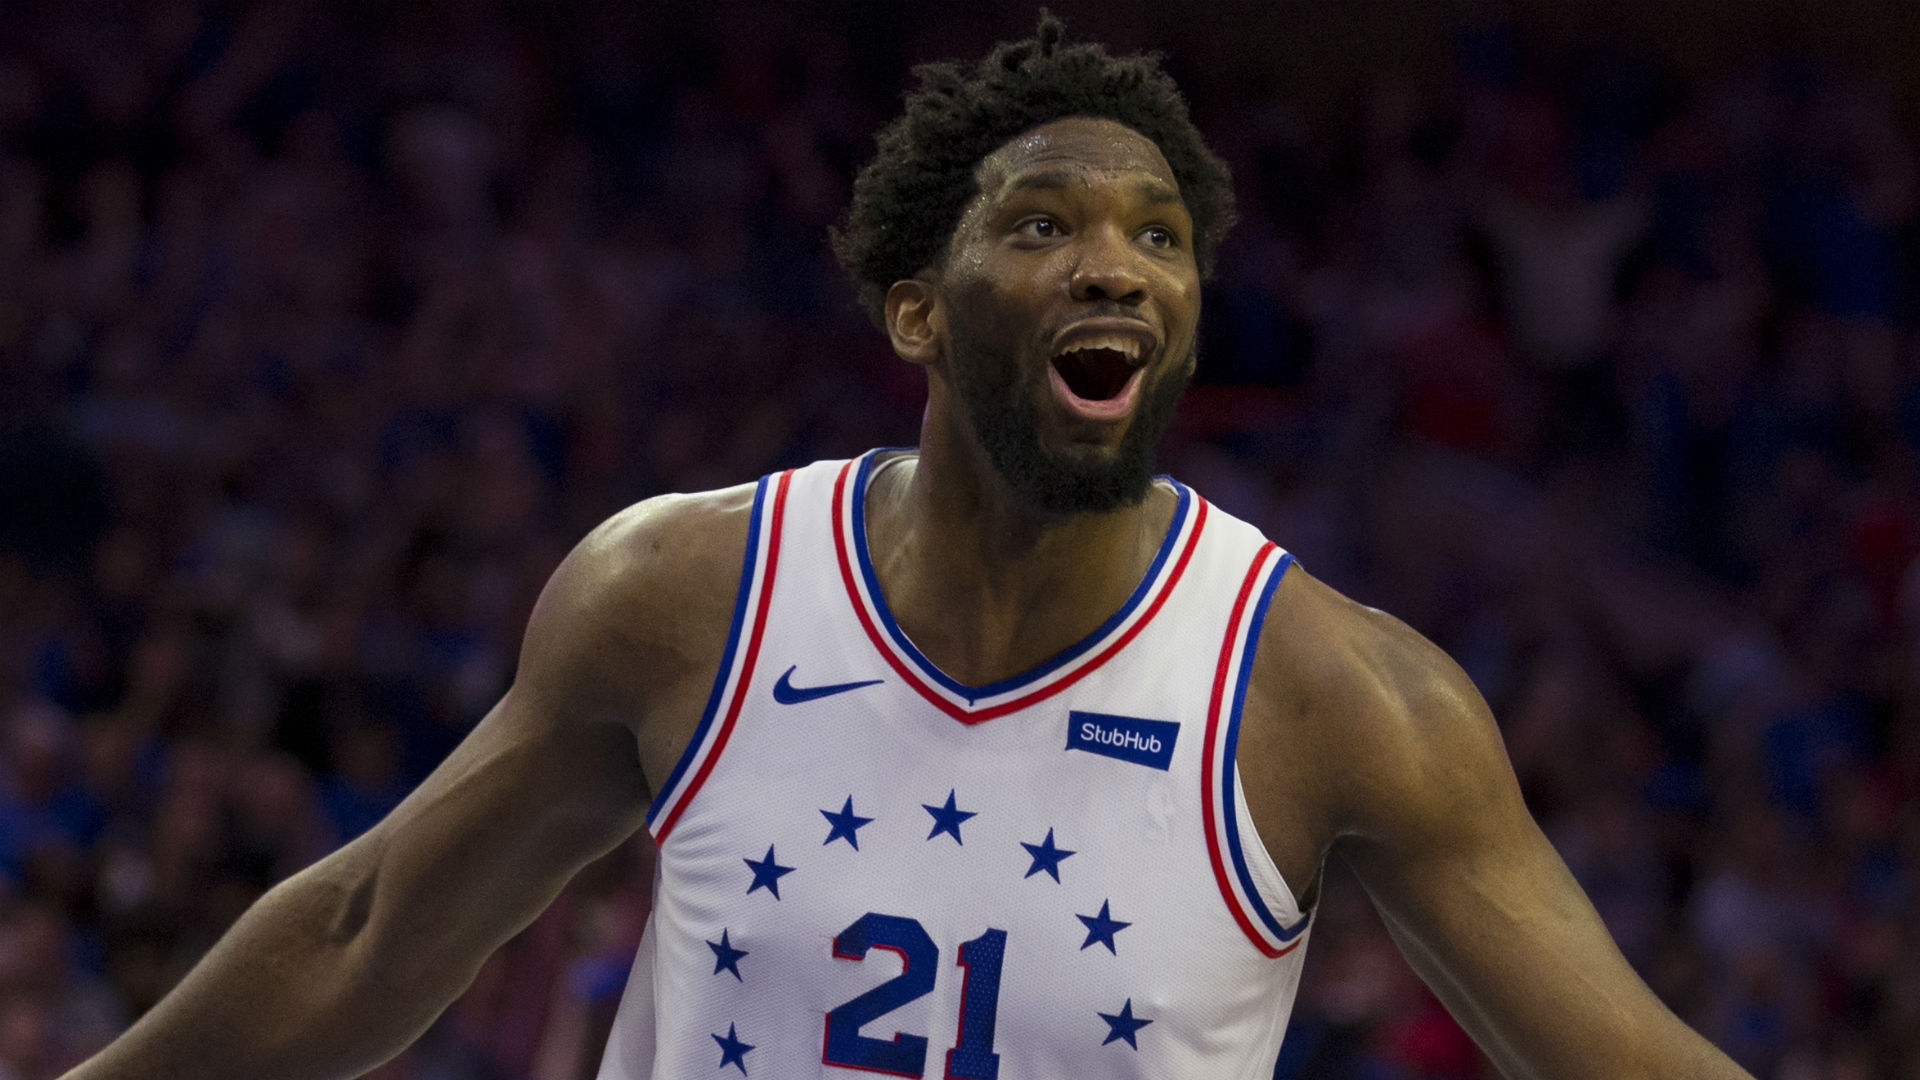 NBA Wrap: Embiid stars as 76ers rally to knock off resurgent Hawks